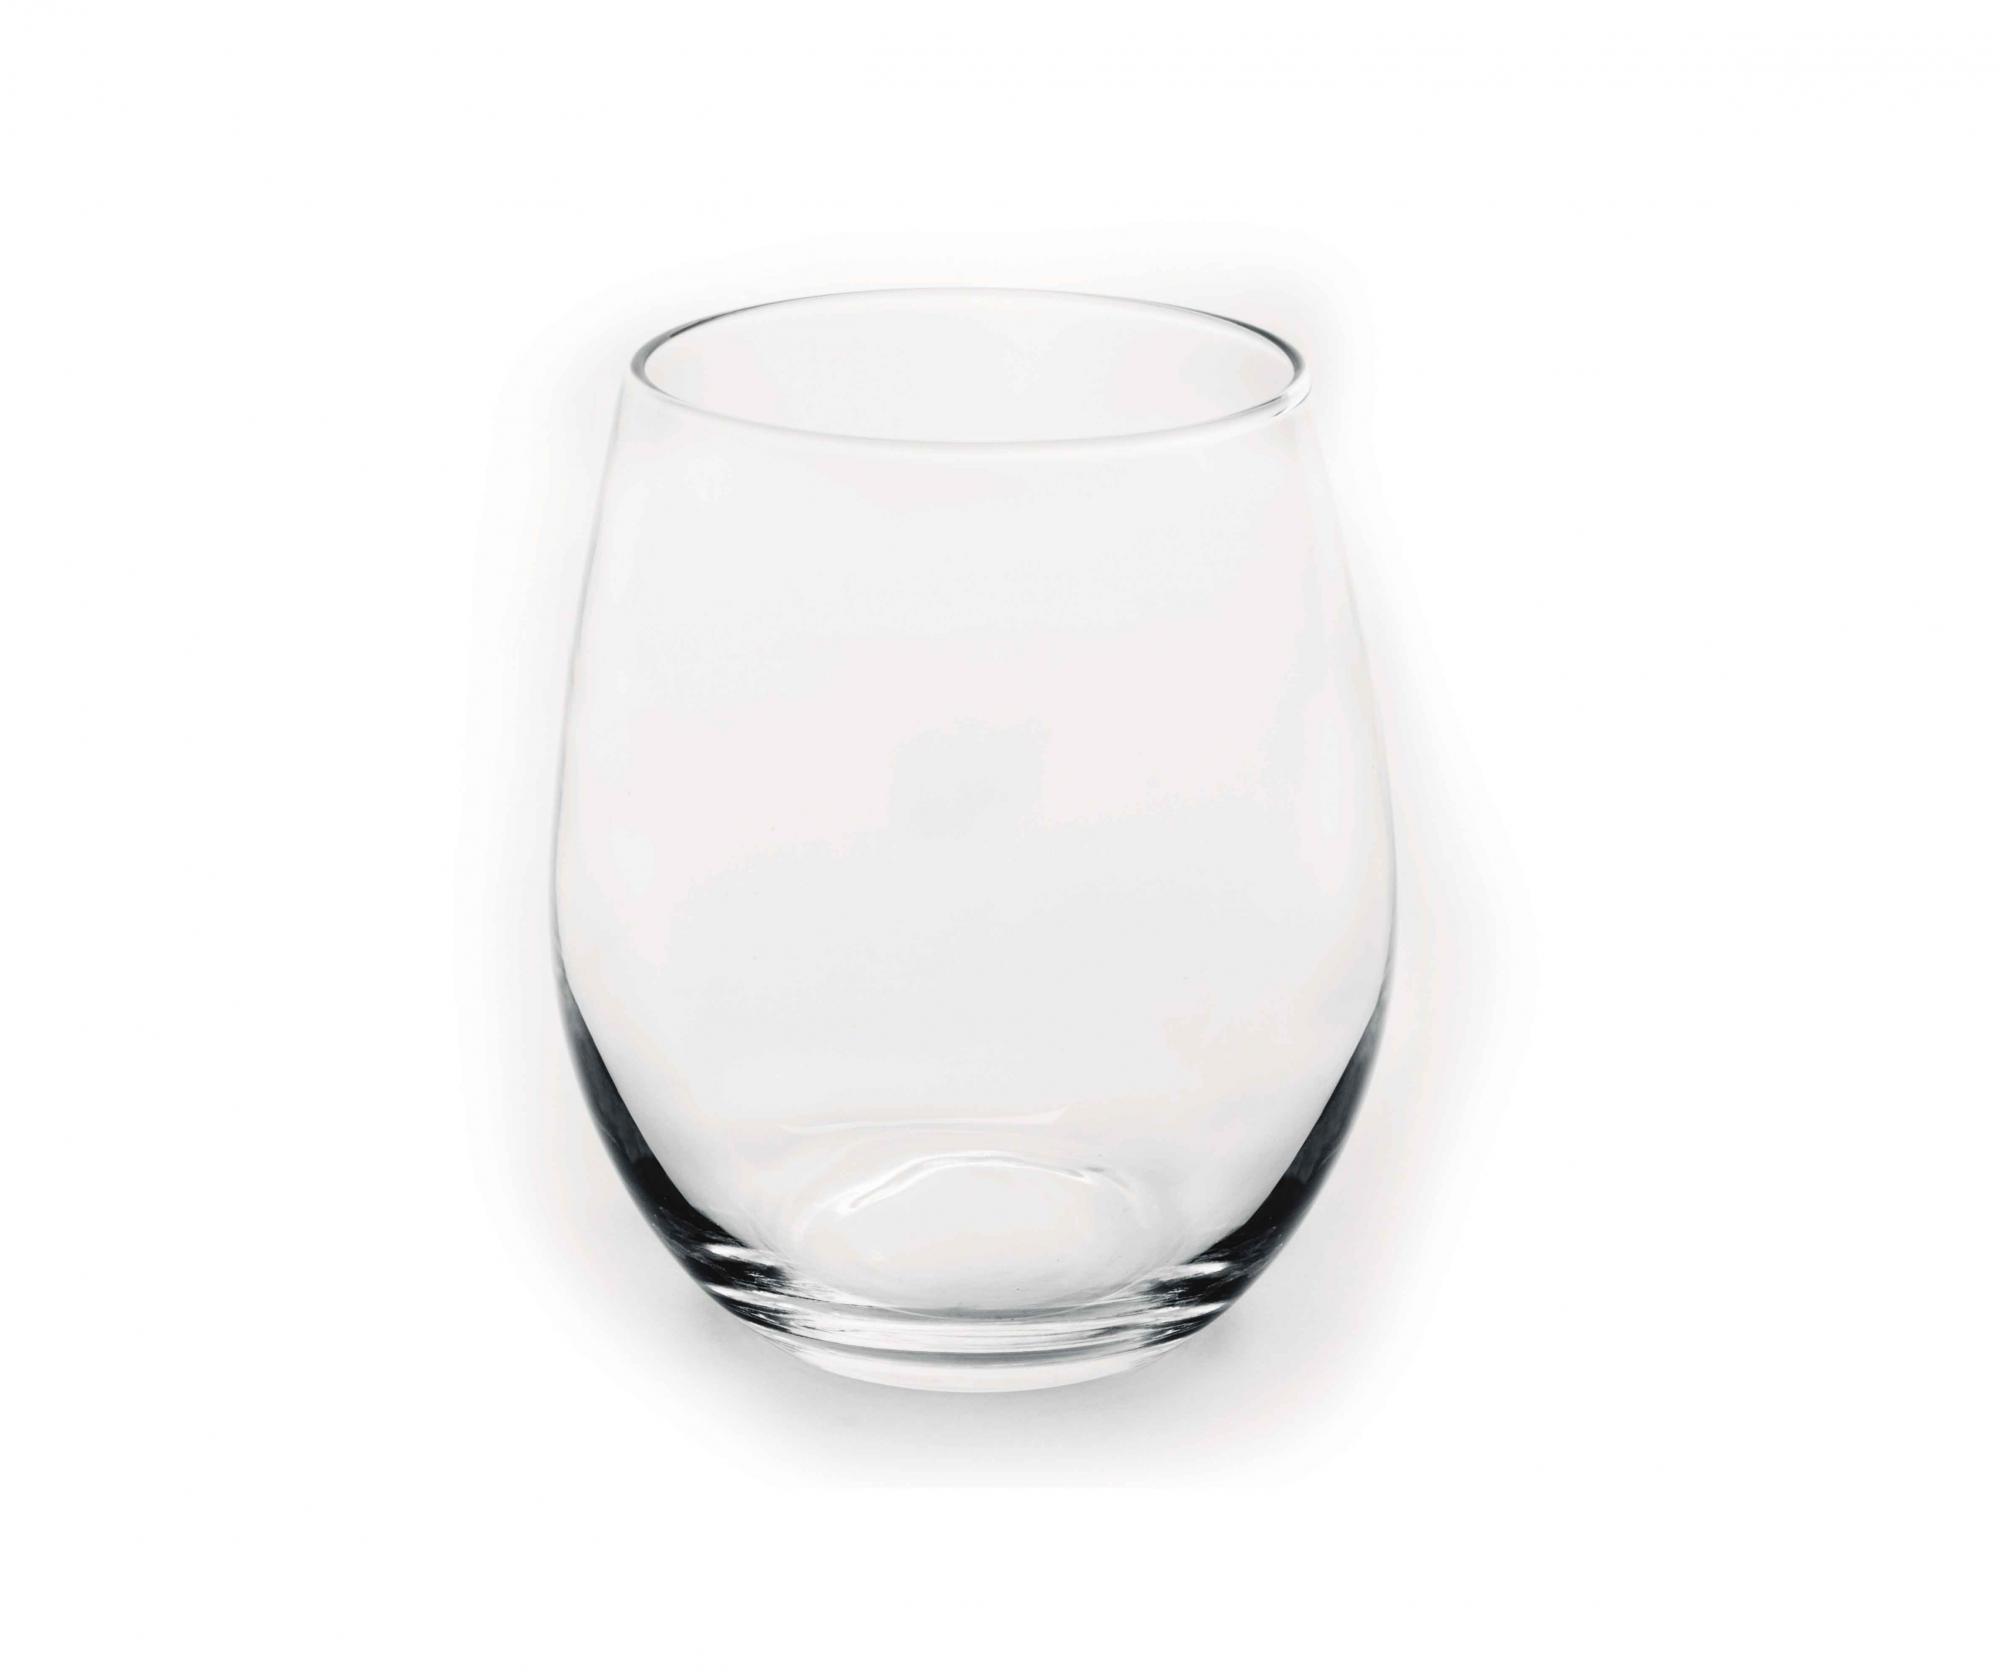 Set 6 pahare pentru apa Dovan 390 ml - Excelsa, Alb